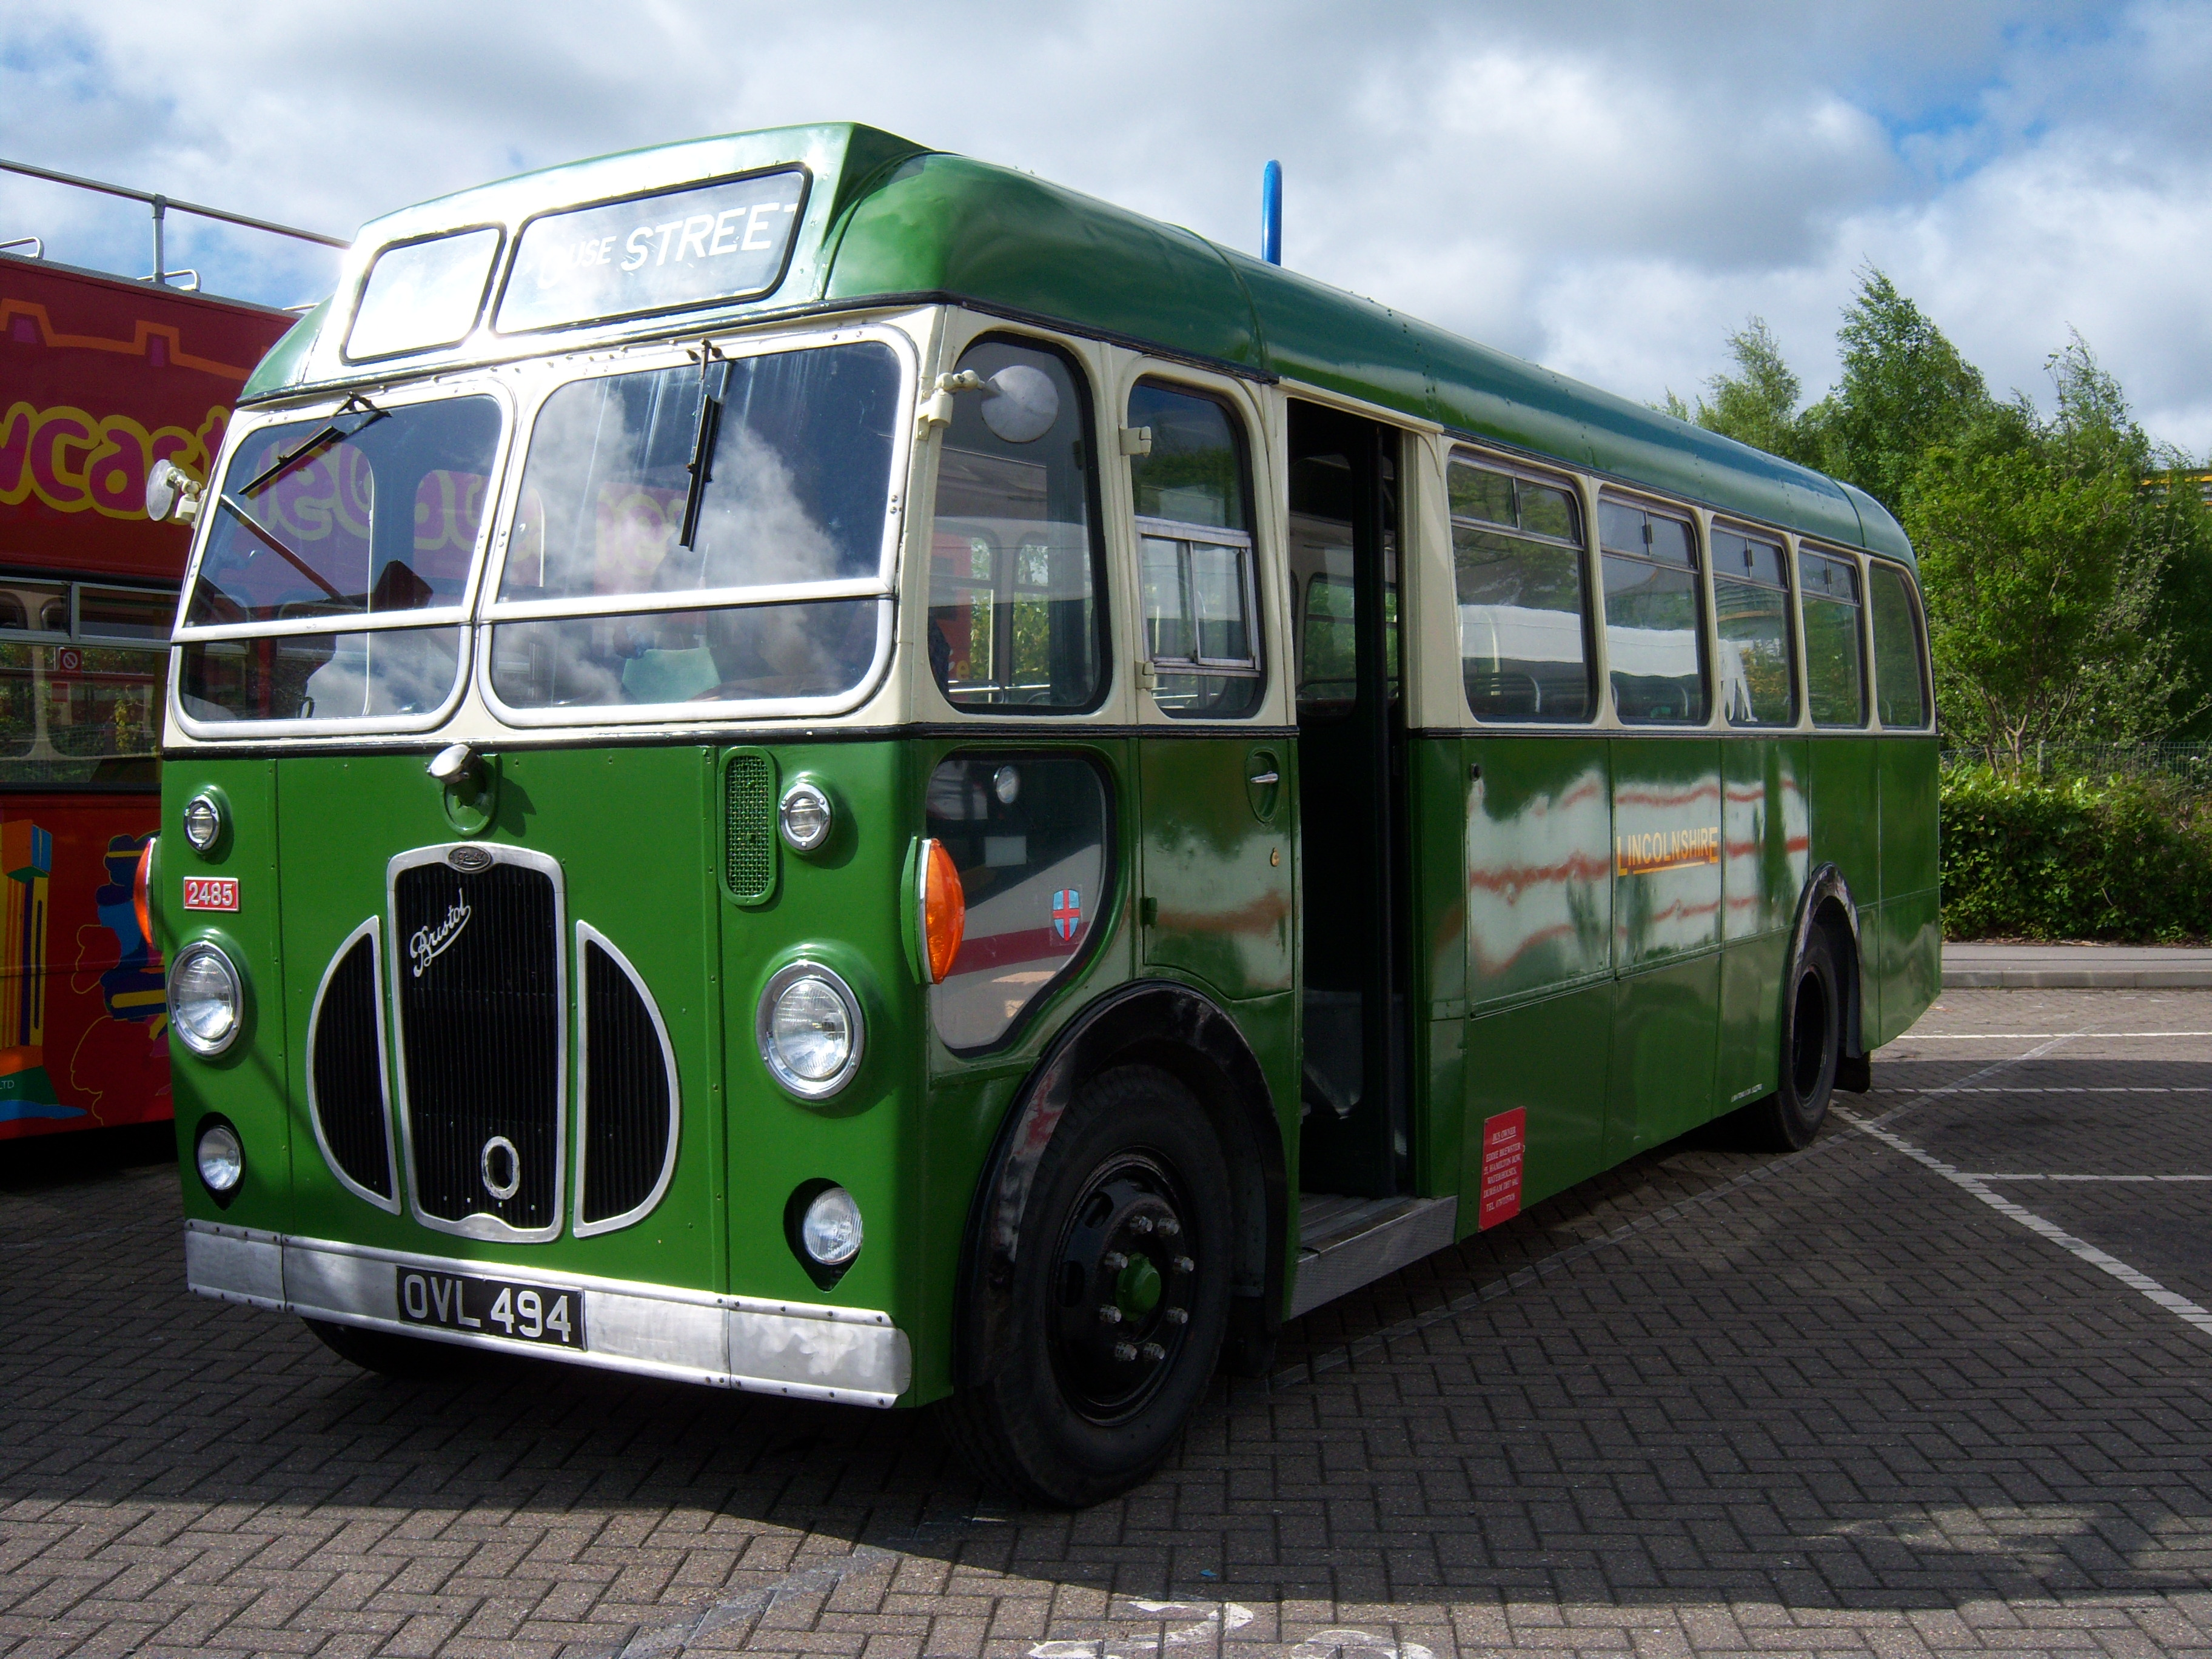 File:Lincolnshire bus 2485 Bristol SC4LK ECW OVL 494 Metrocentre rally 2009  (4)